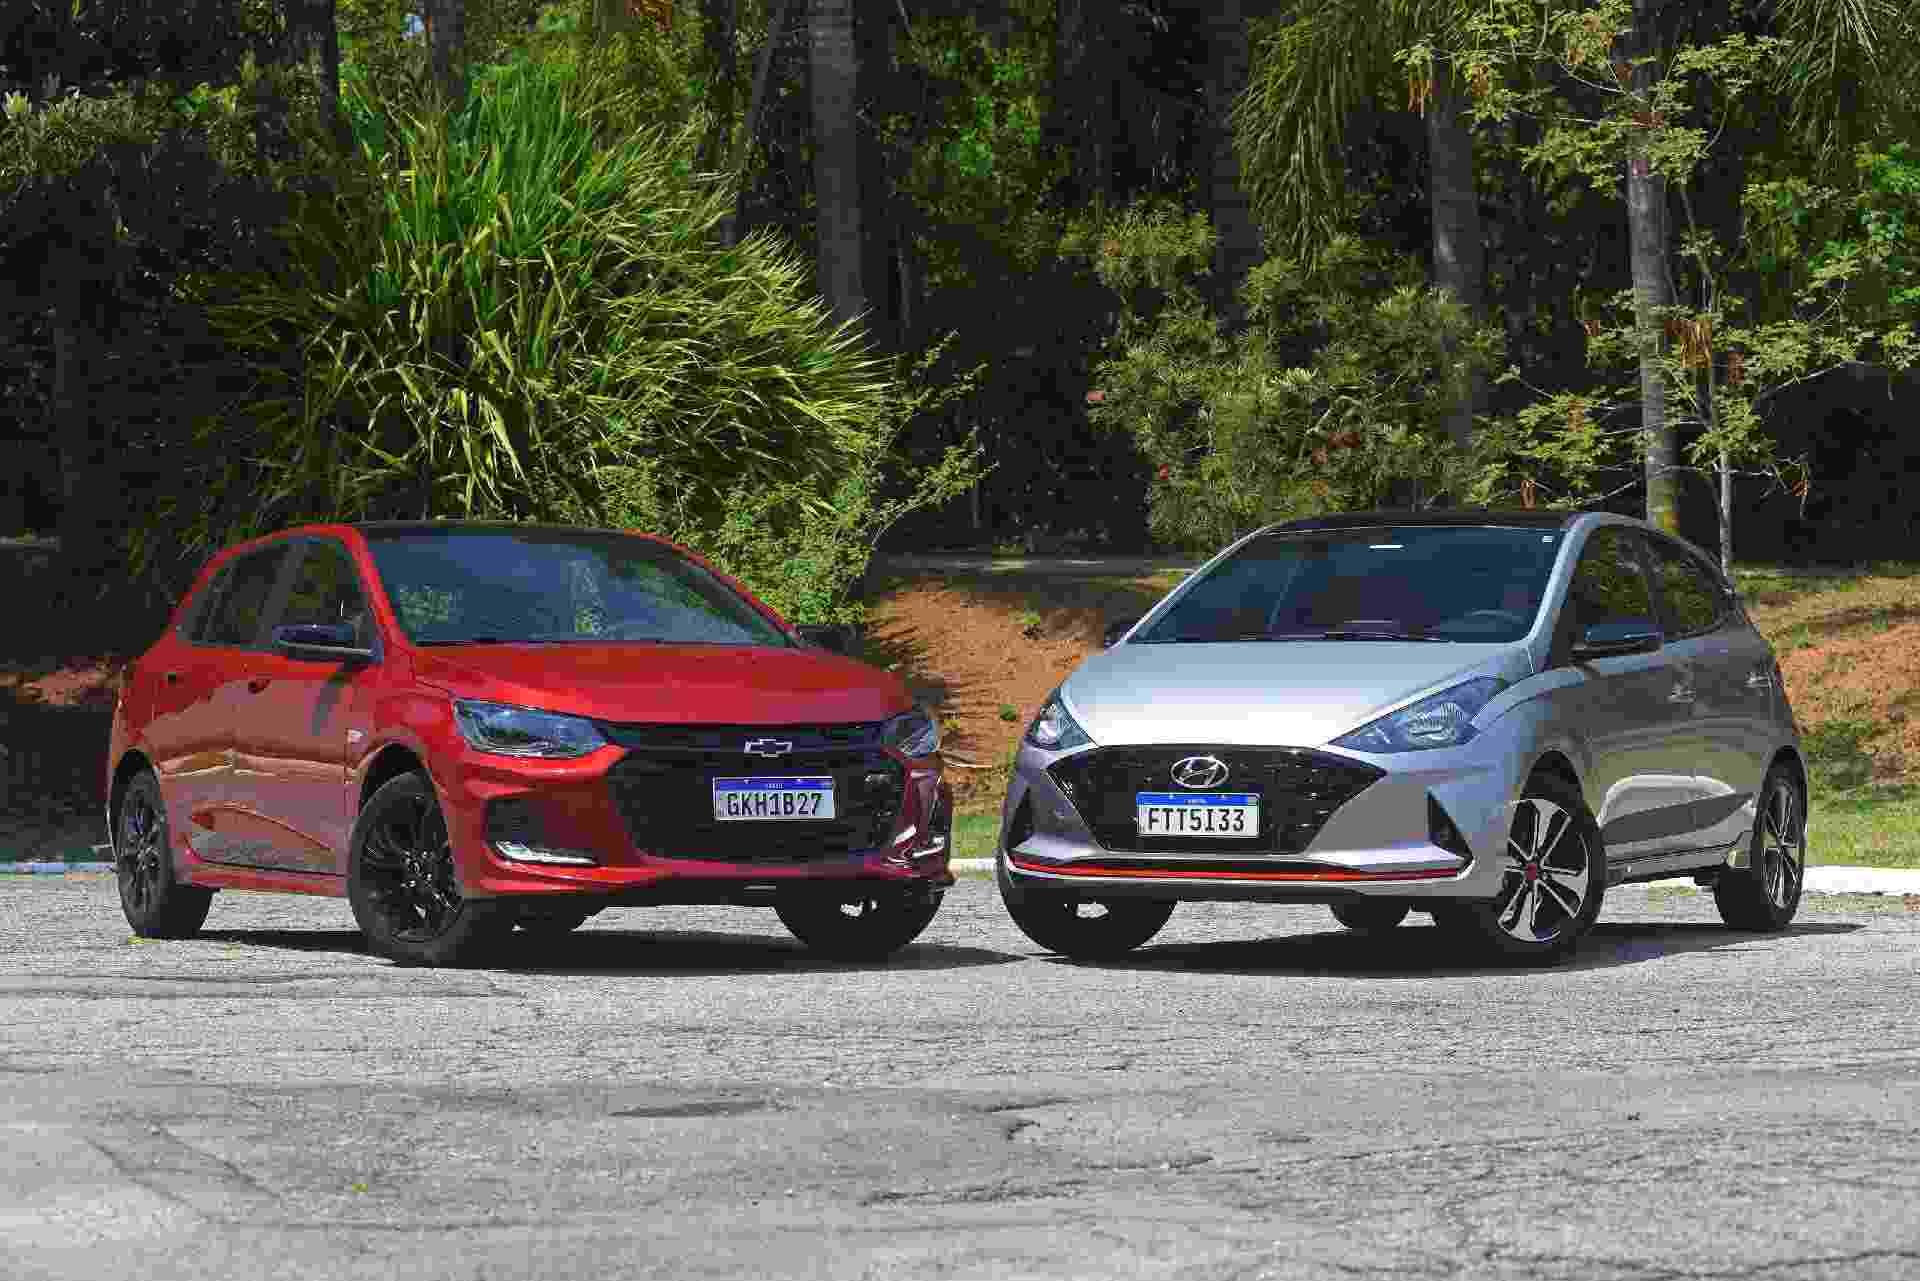 Chevrolet Onix RS x Hyundai HB20 Sport - Murilo Góes/UOL